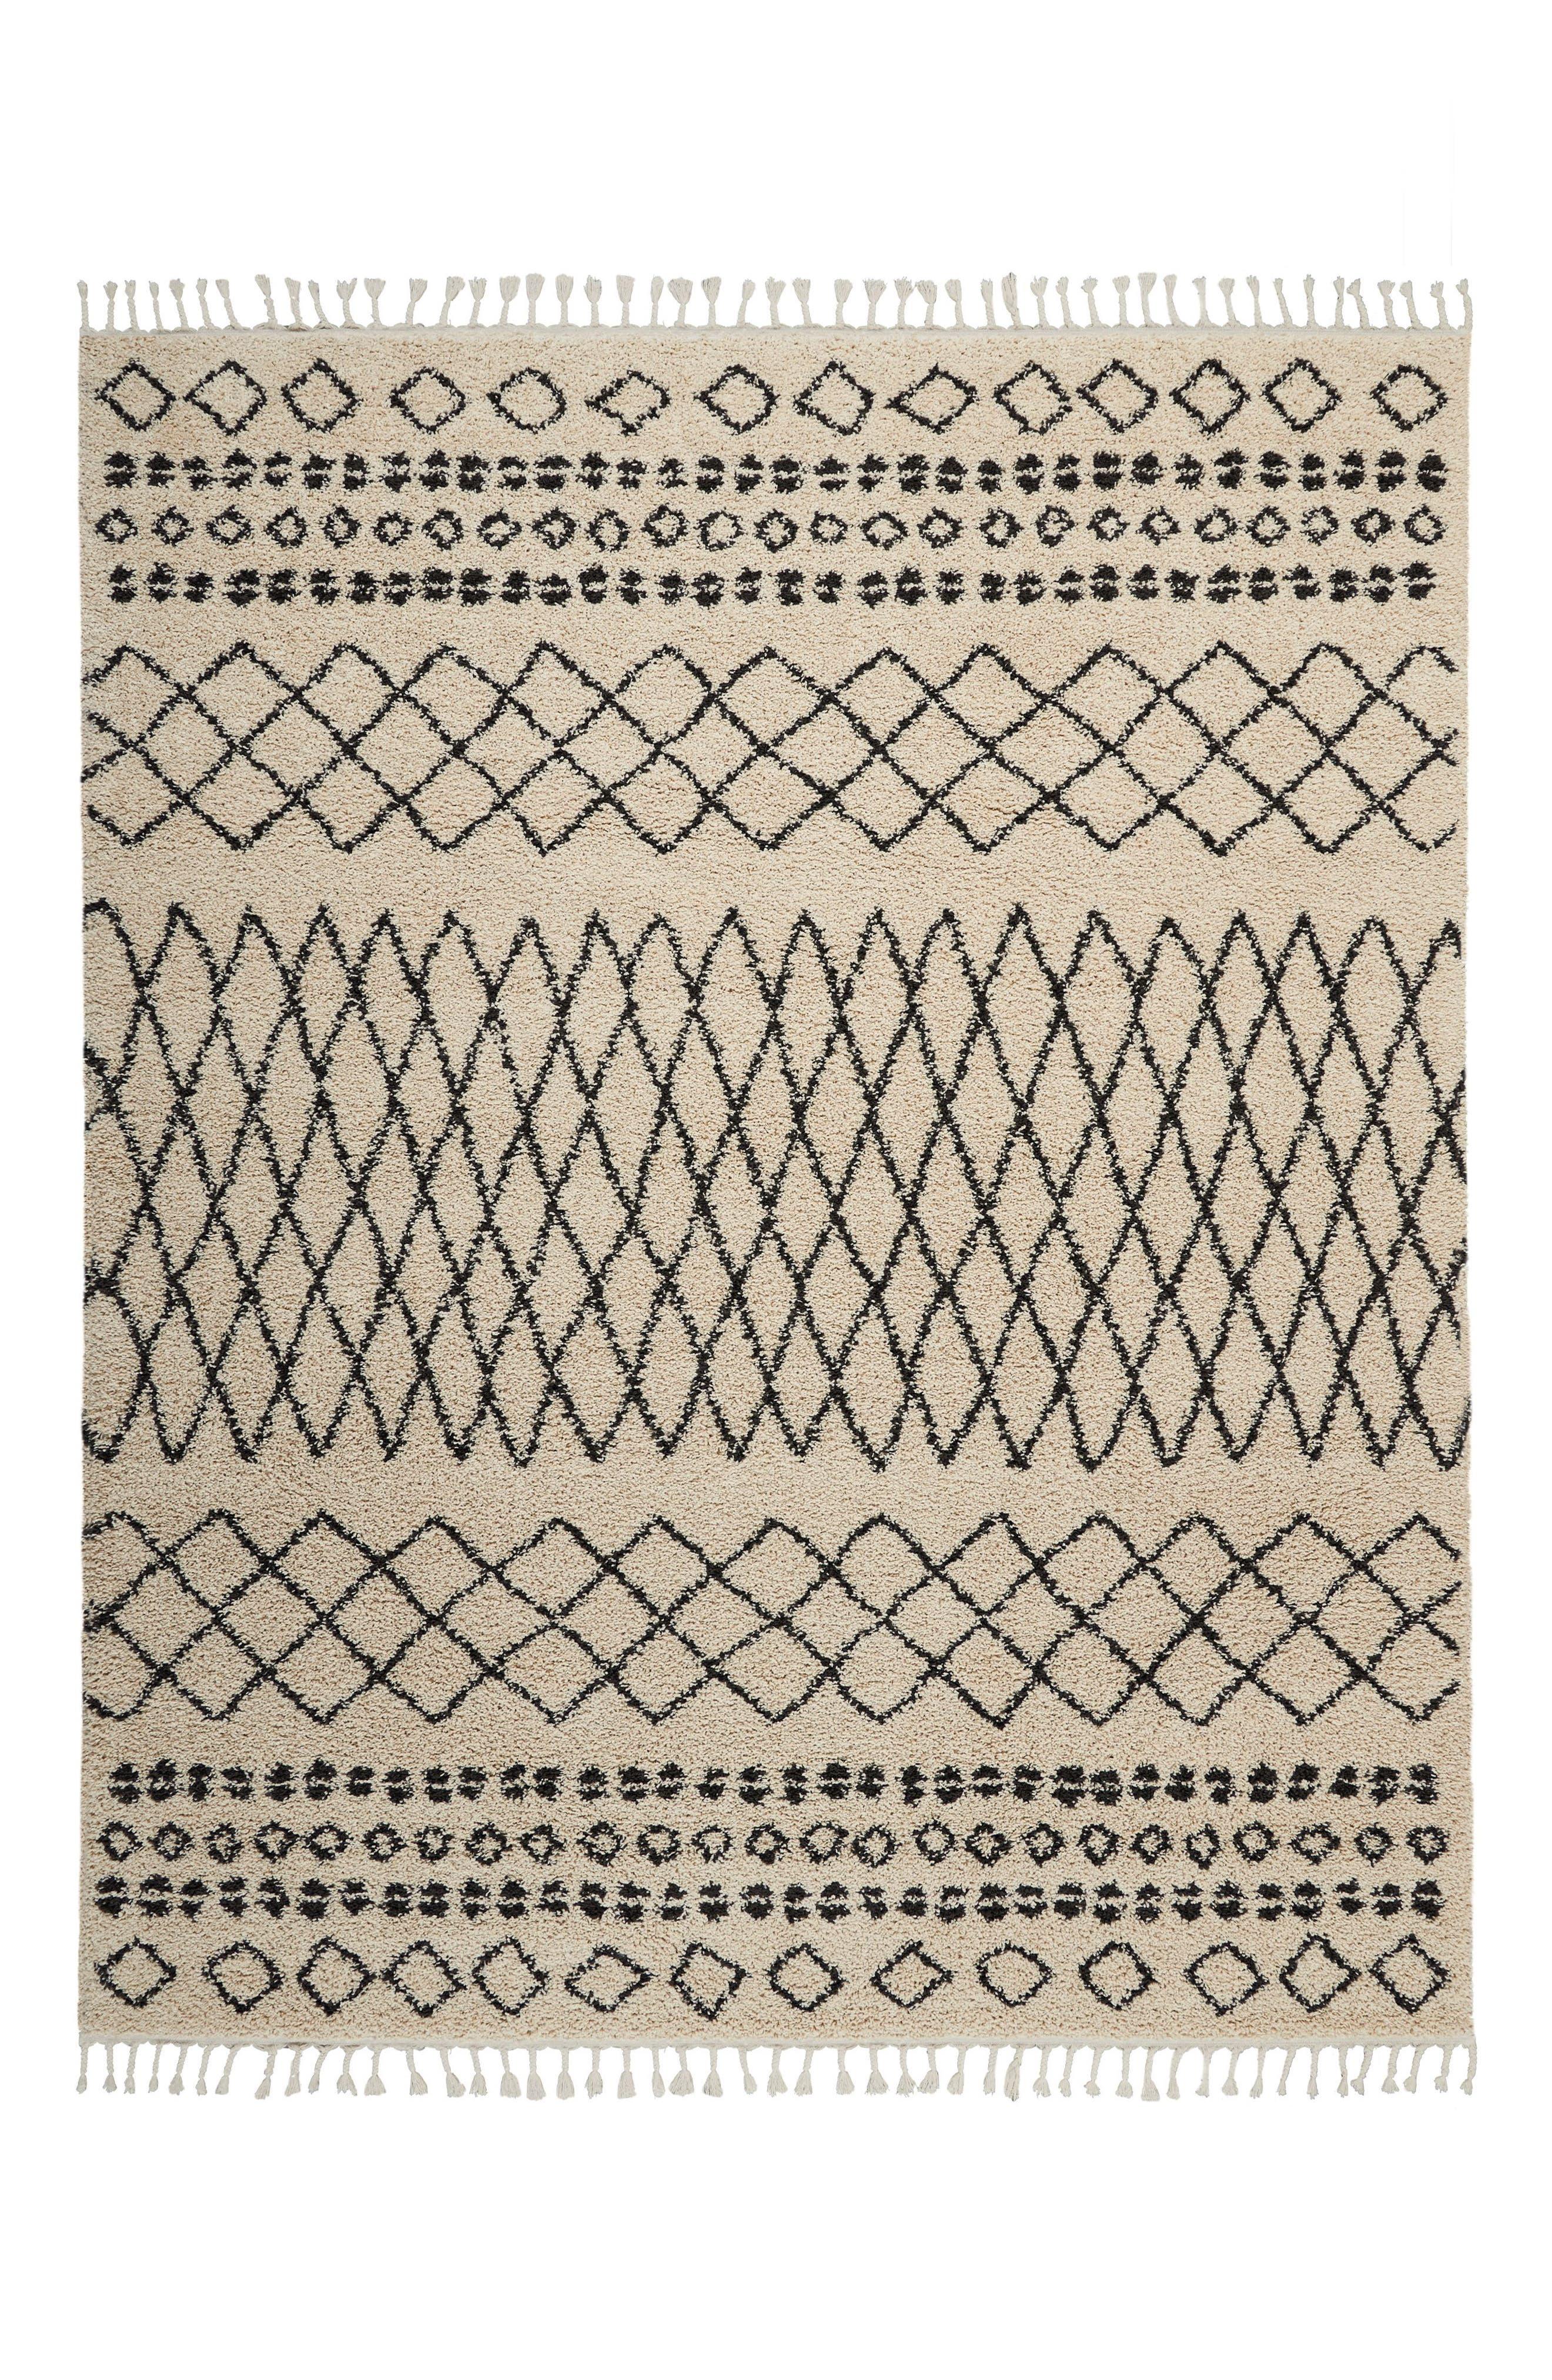 Alternate Image 1 Selected - Nourison Marrakesh Shag Rug